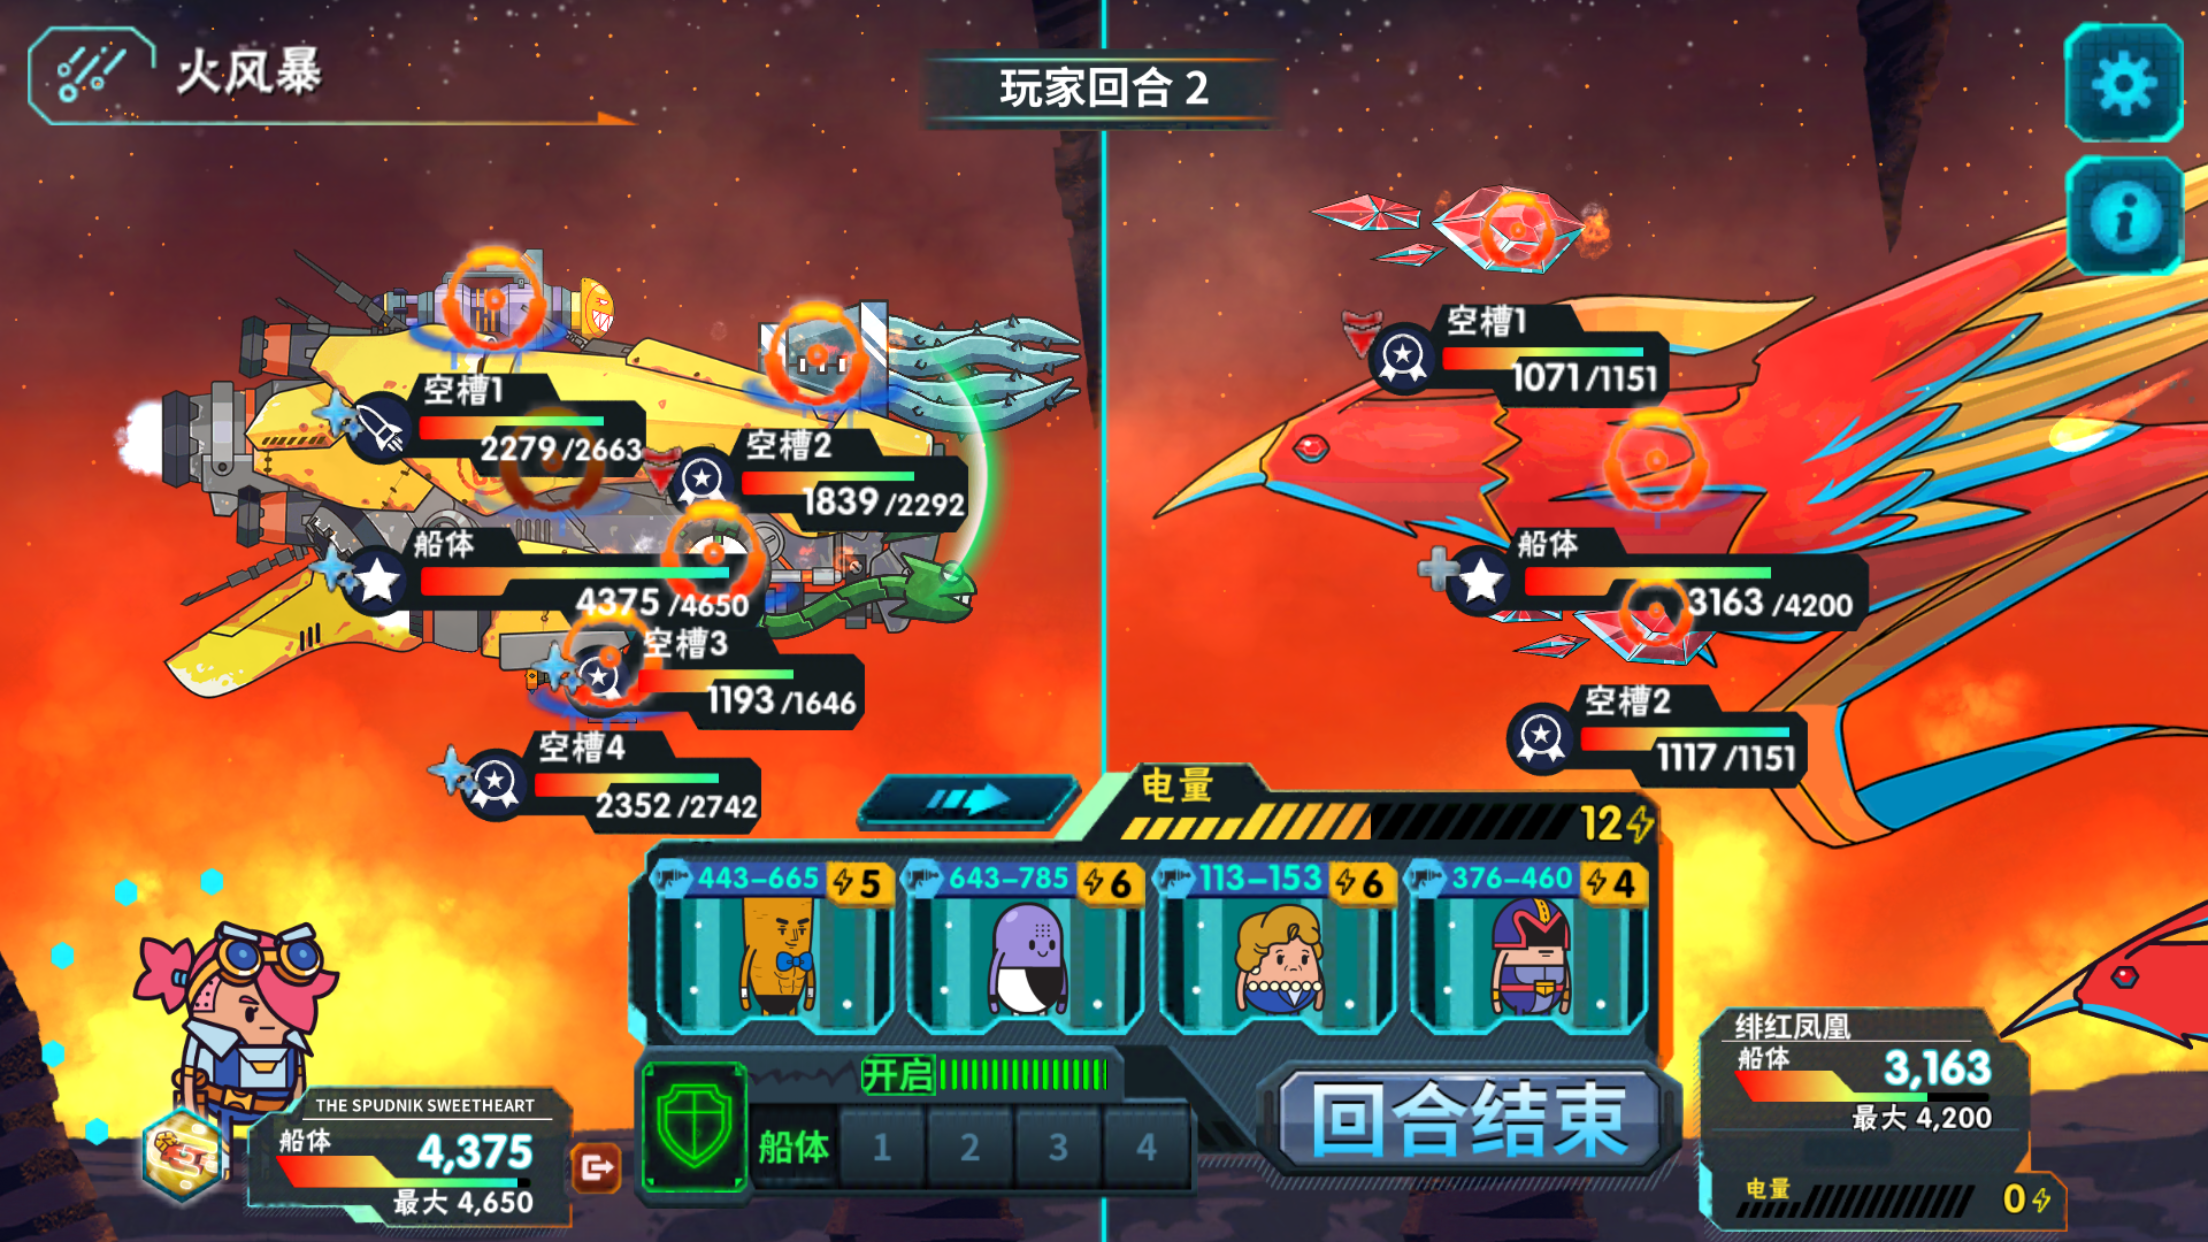 Screenshot 1: 看!馬鈴薯們的宇宙飛船?!【官方安卓版首發】